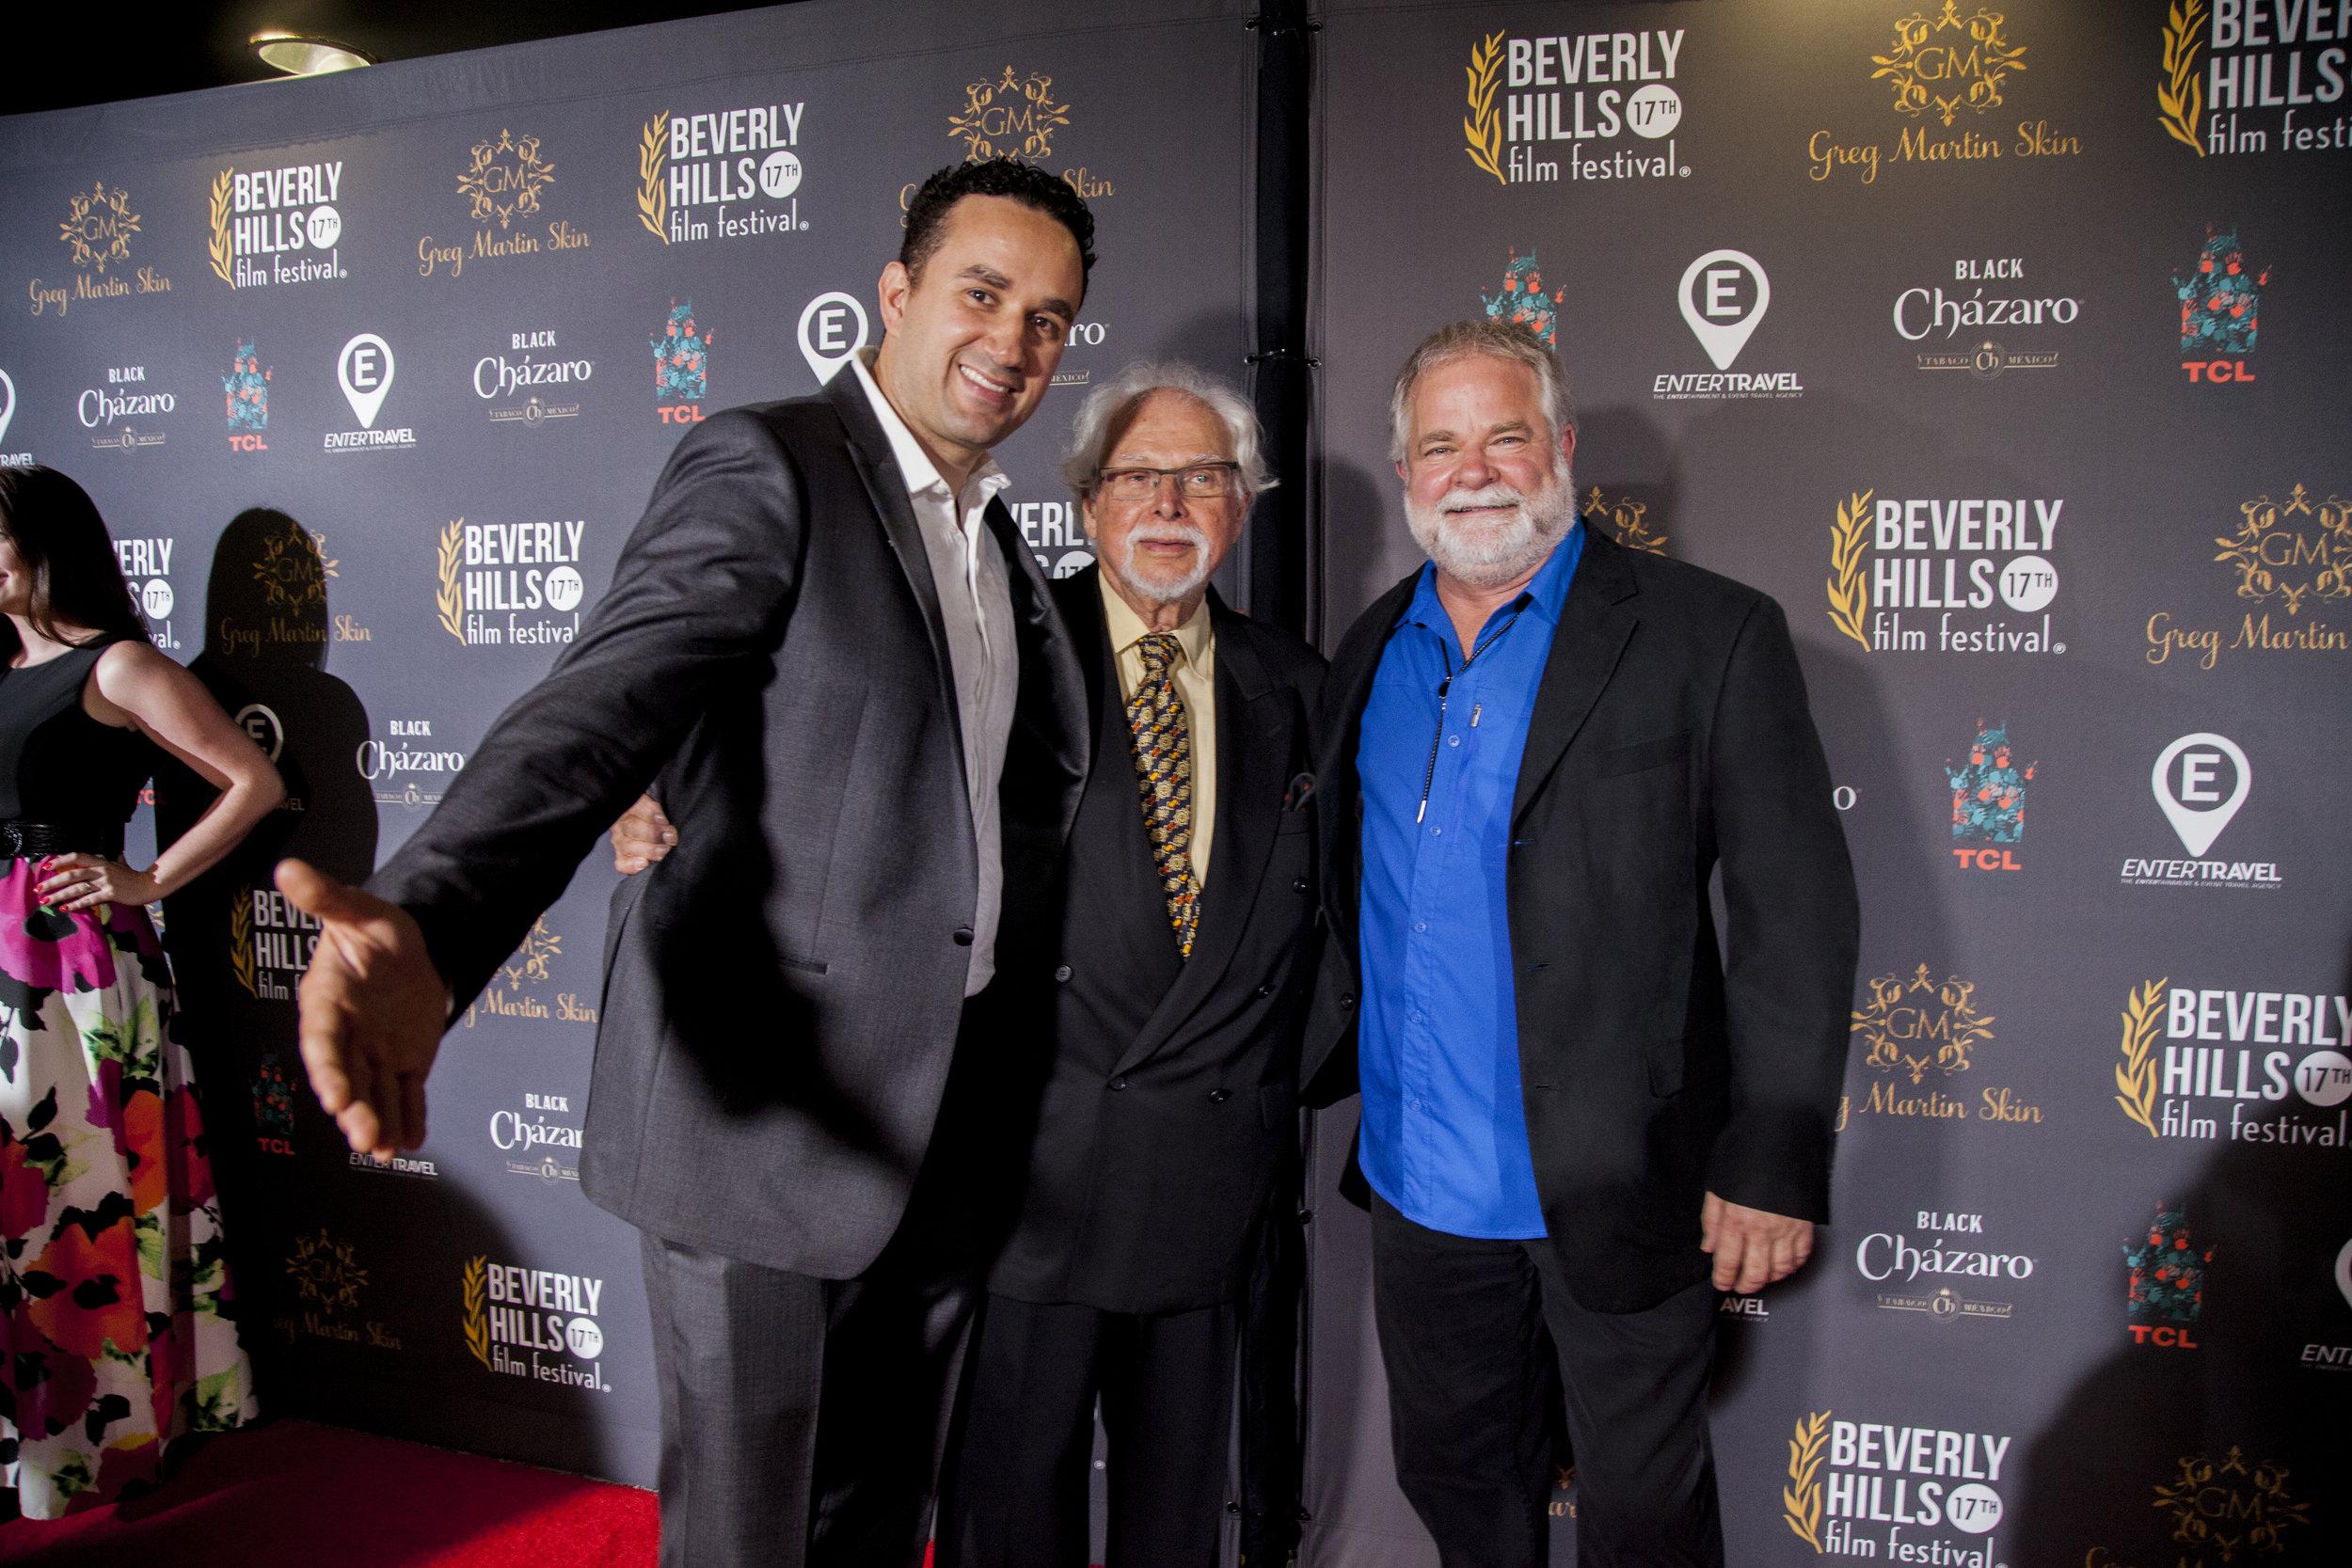 "From left: director Leonardo Corbucci, Legendary AD Burt Bluestein, Legendary AD Arthur Anderson. Chinese Theatre,  ""BEVERLY HILLS FILM FESTIVAL"""